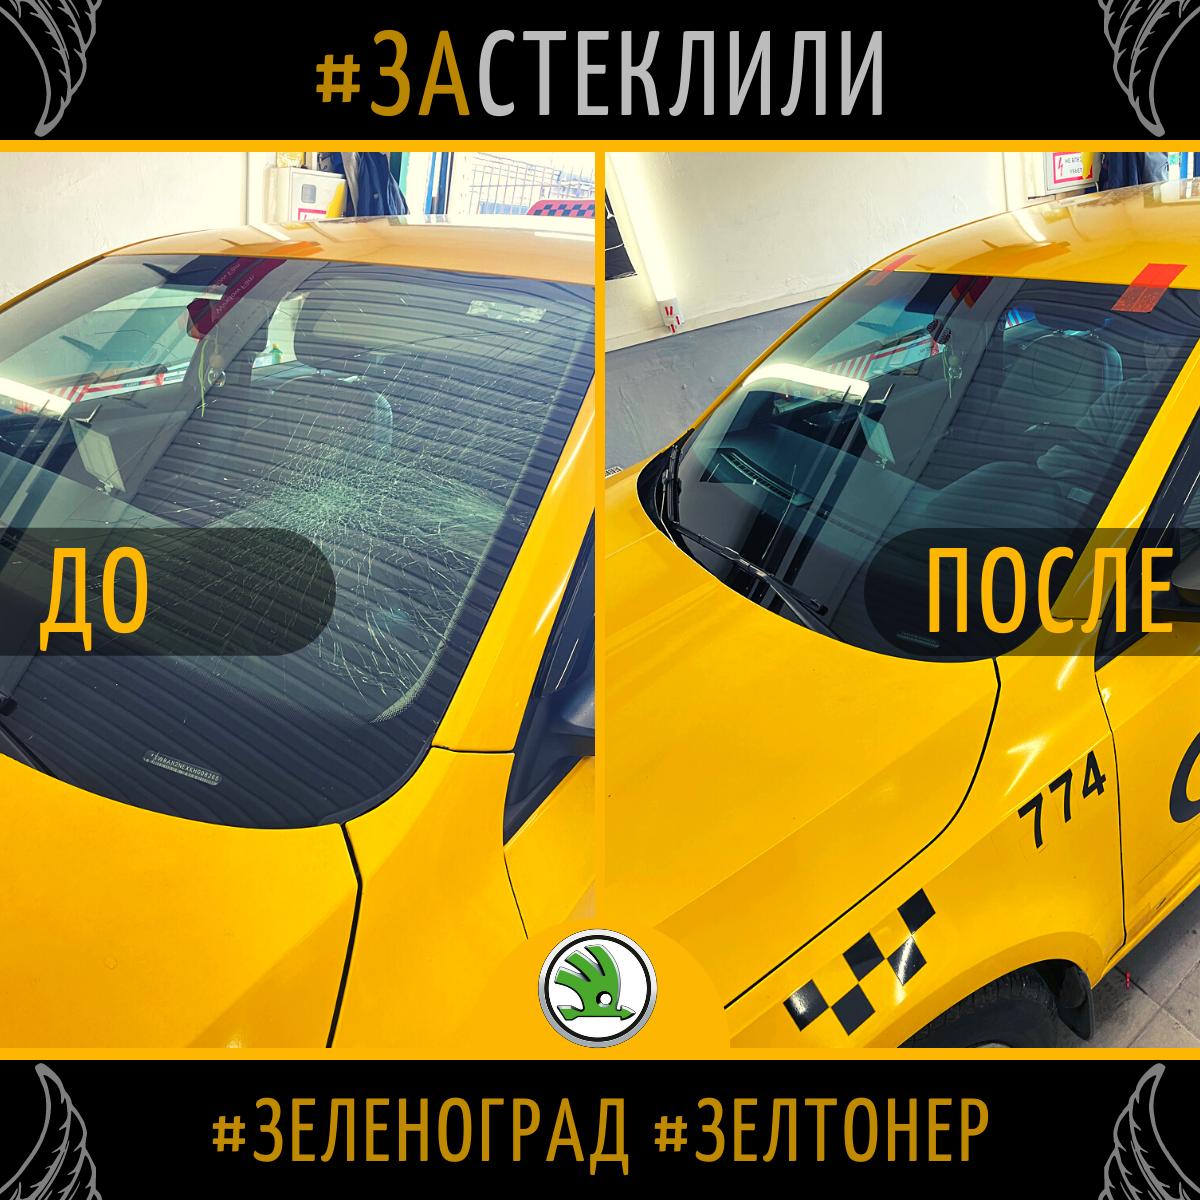 Замена автостекла Шкода - лобовое стекло (фото до и после) ✌😎